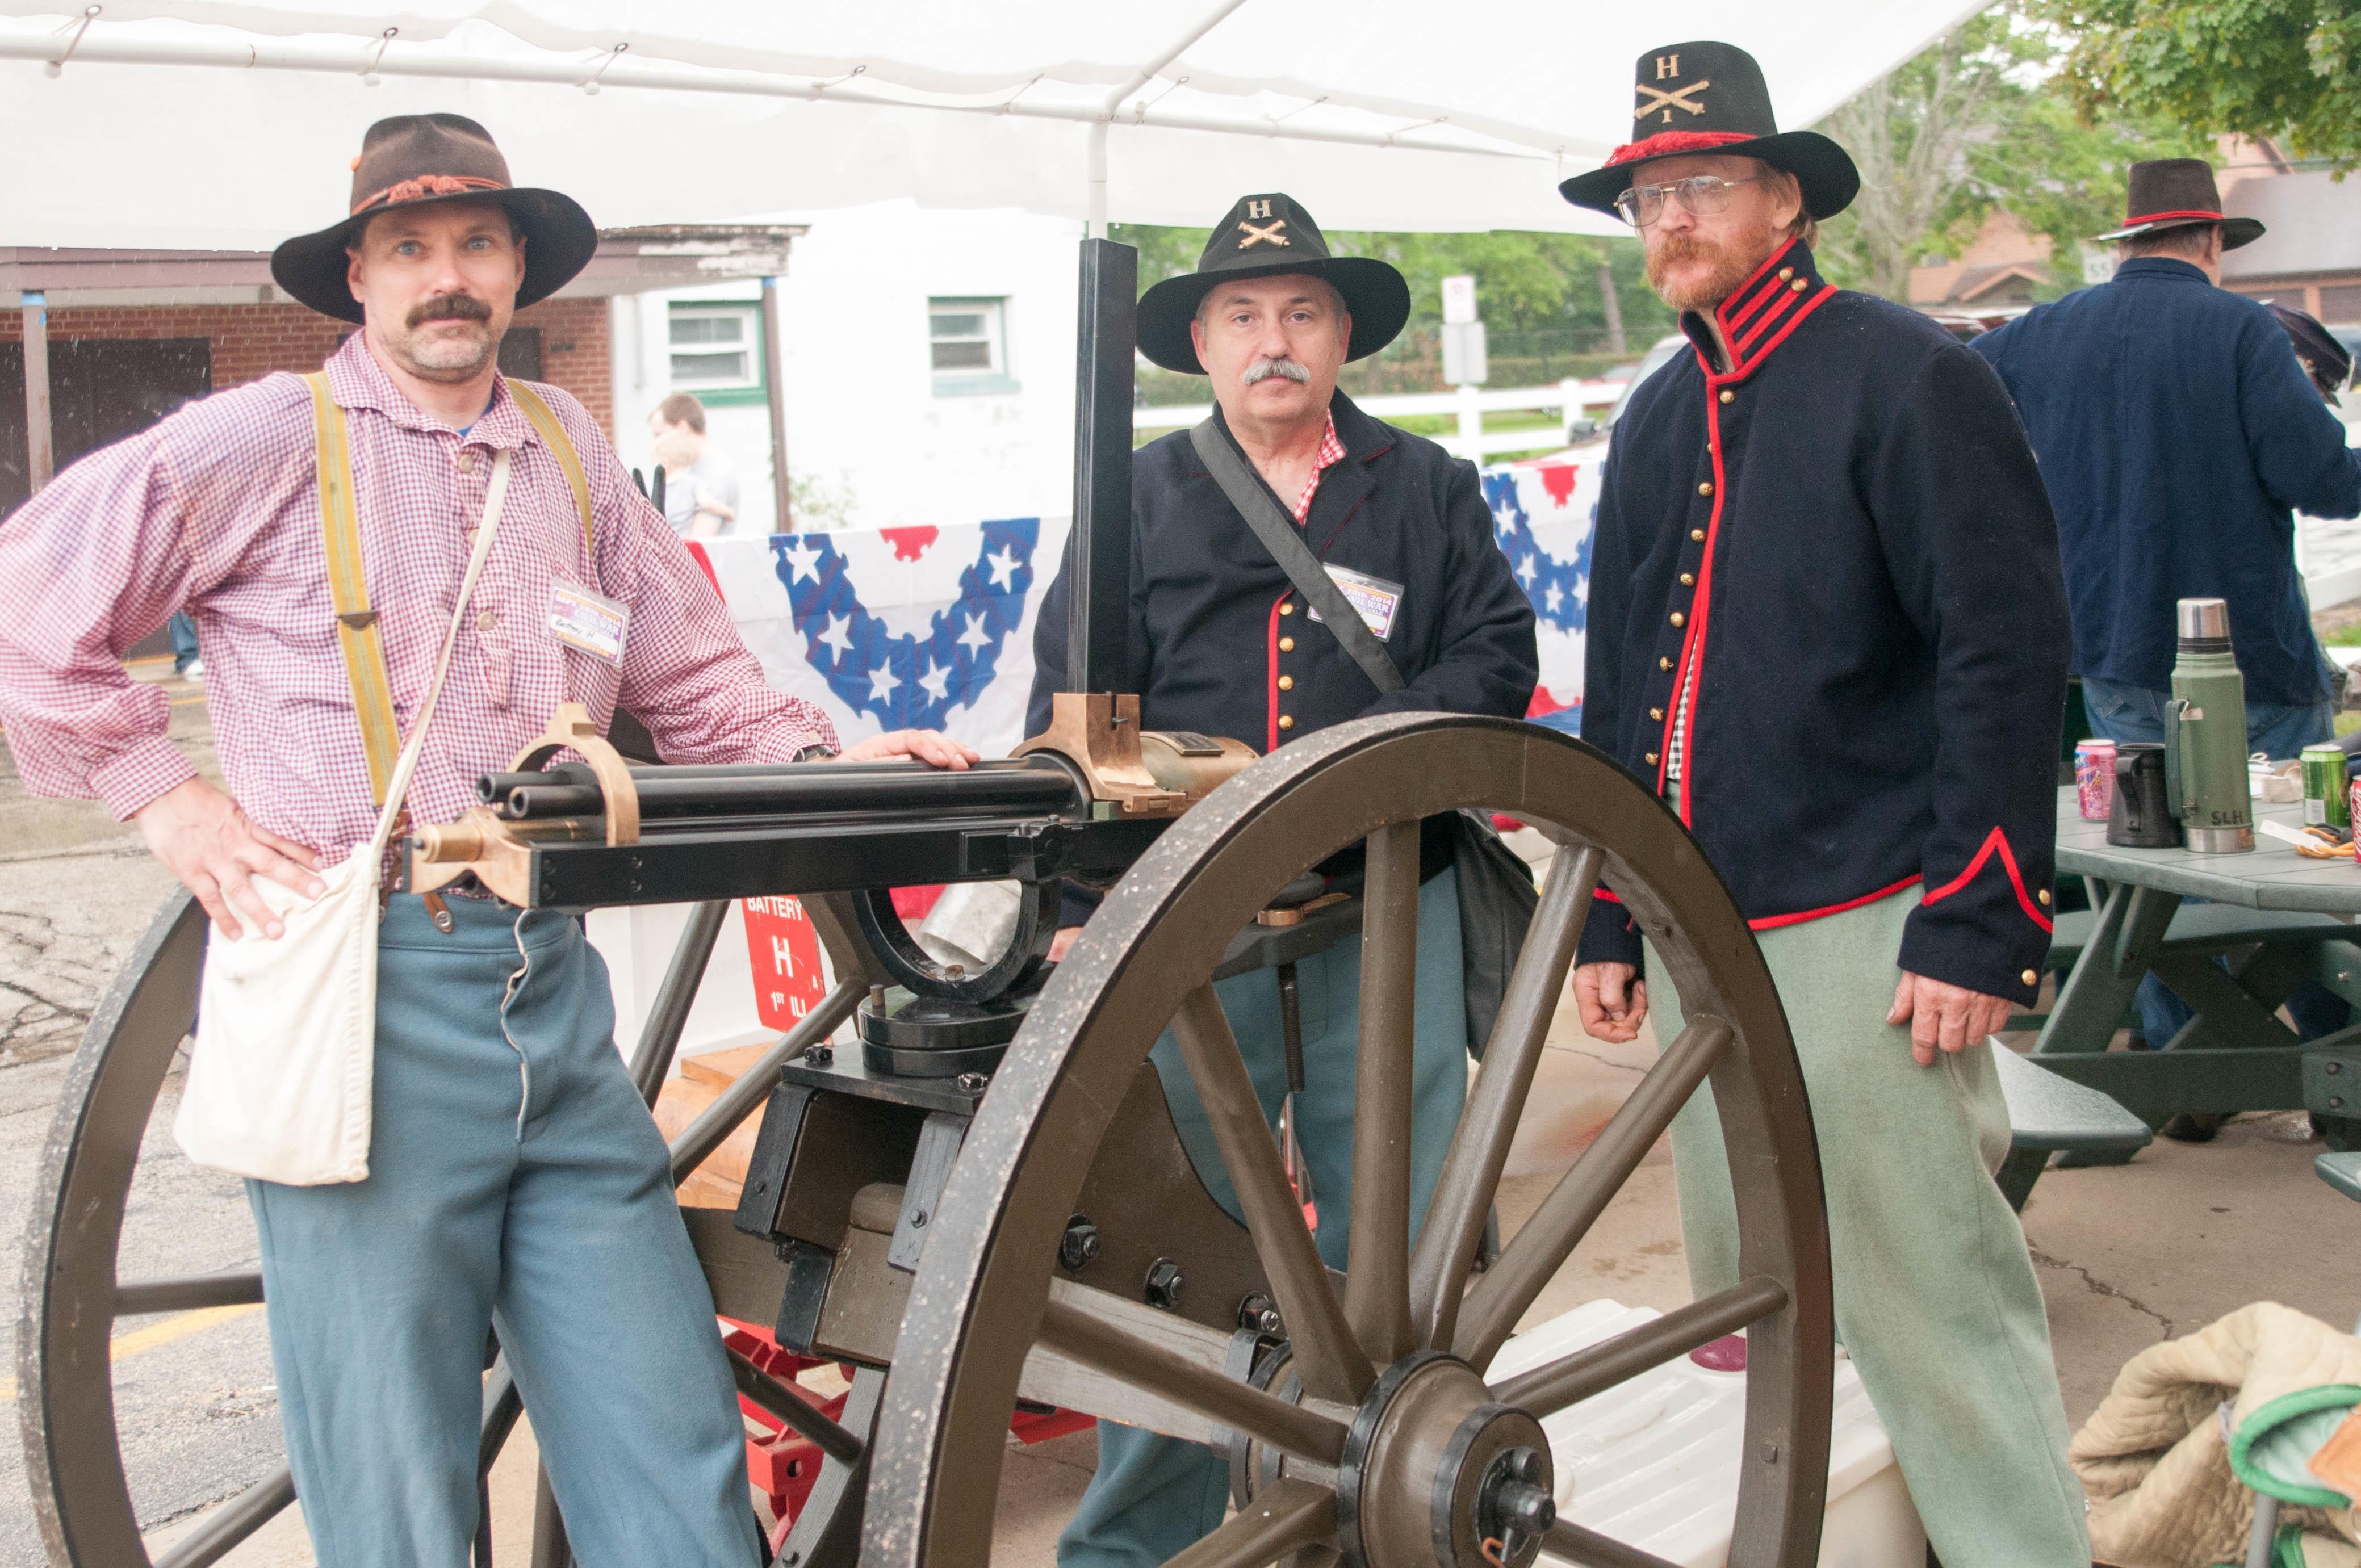 Wheaton_Civil_War_Flea_Market-49